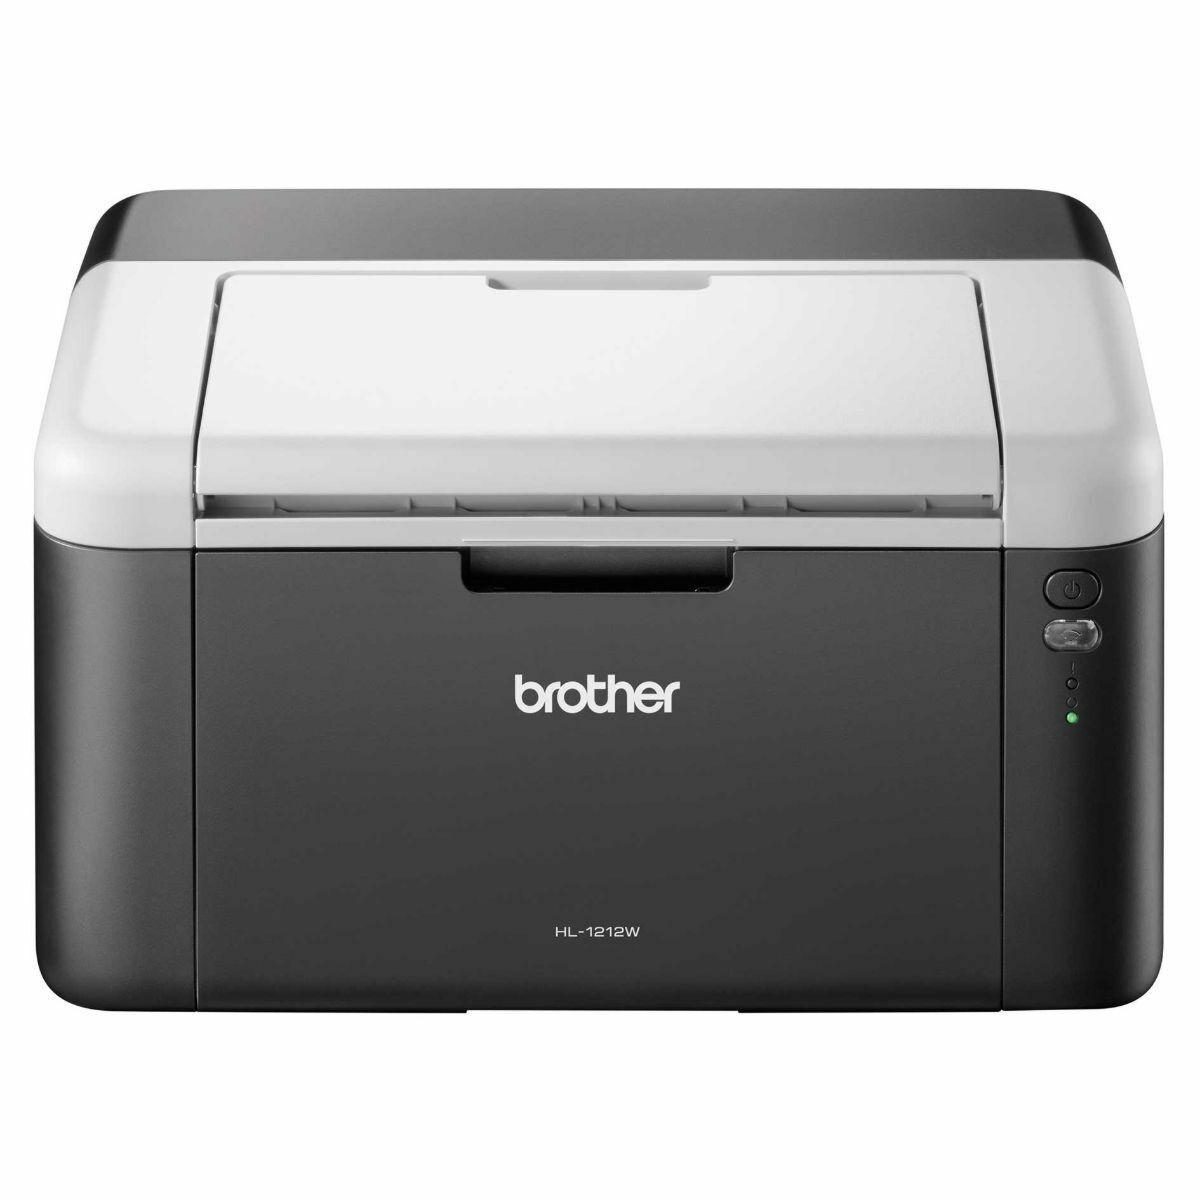 Brother HL-1212W Wireless Mono Laser Printer Free Click & Collect £89.99 @ Ryman